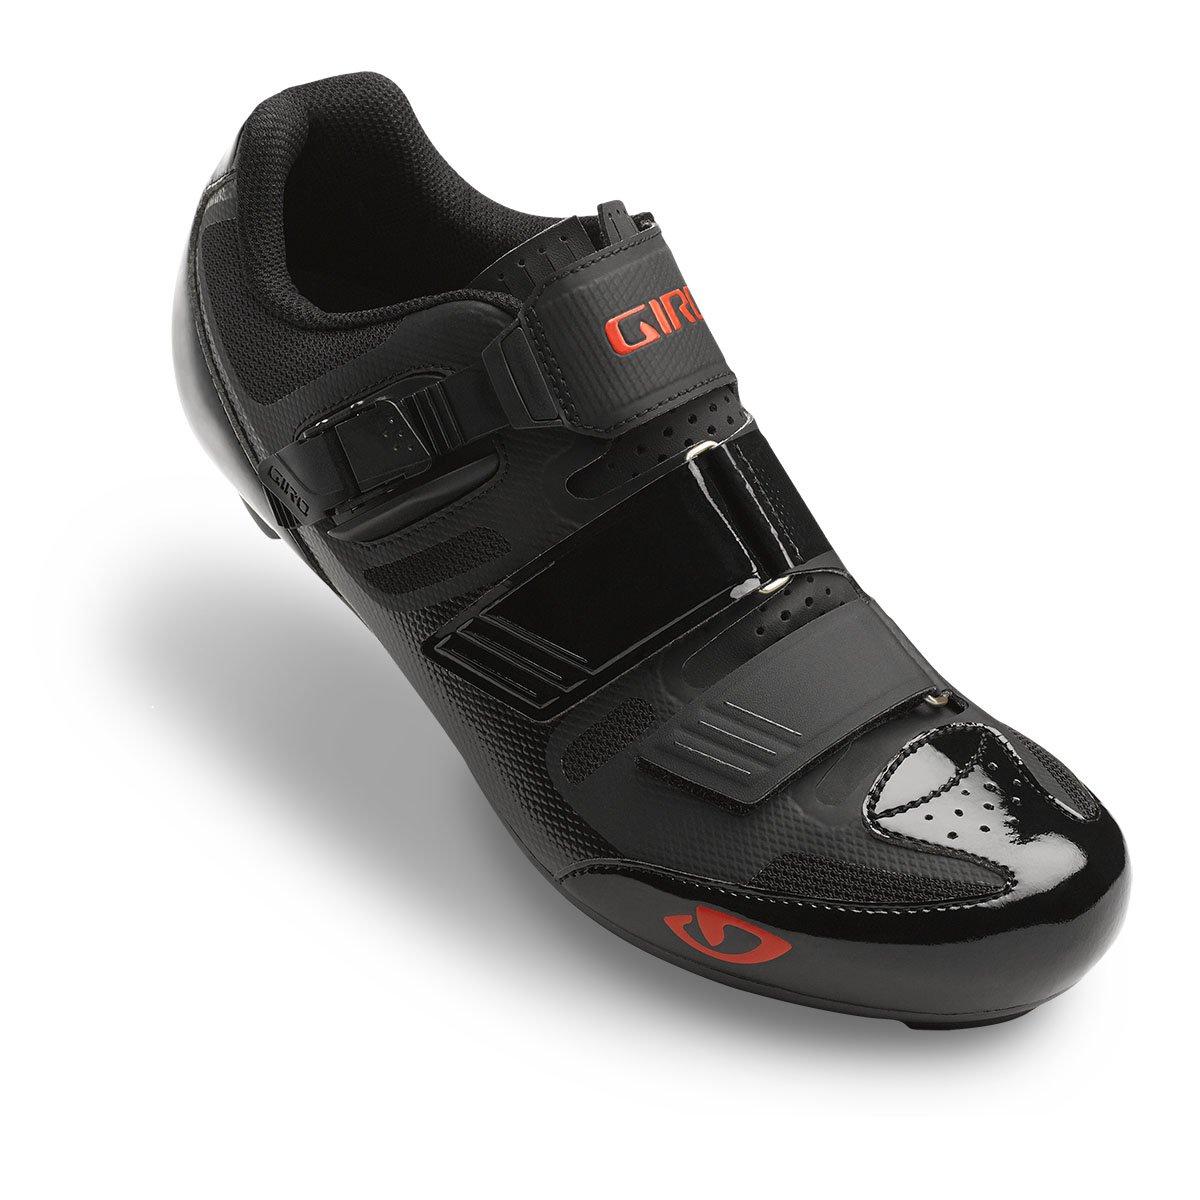 Giro メンズ Giro 40.5 EU Black / Bright Red B015T72A4M